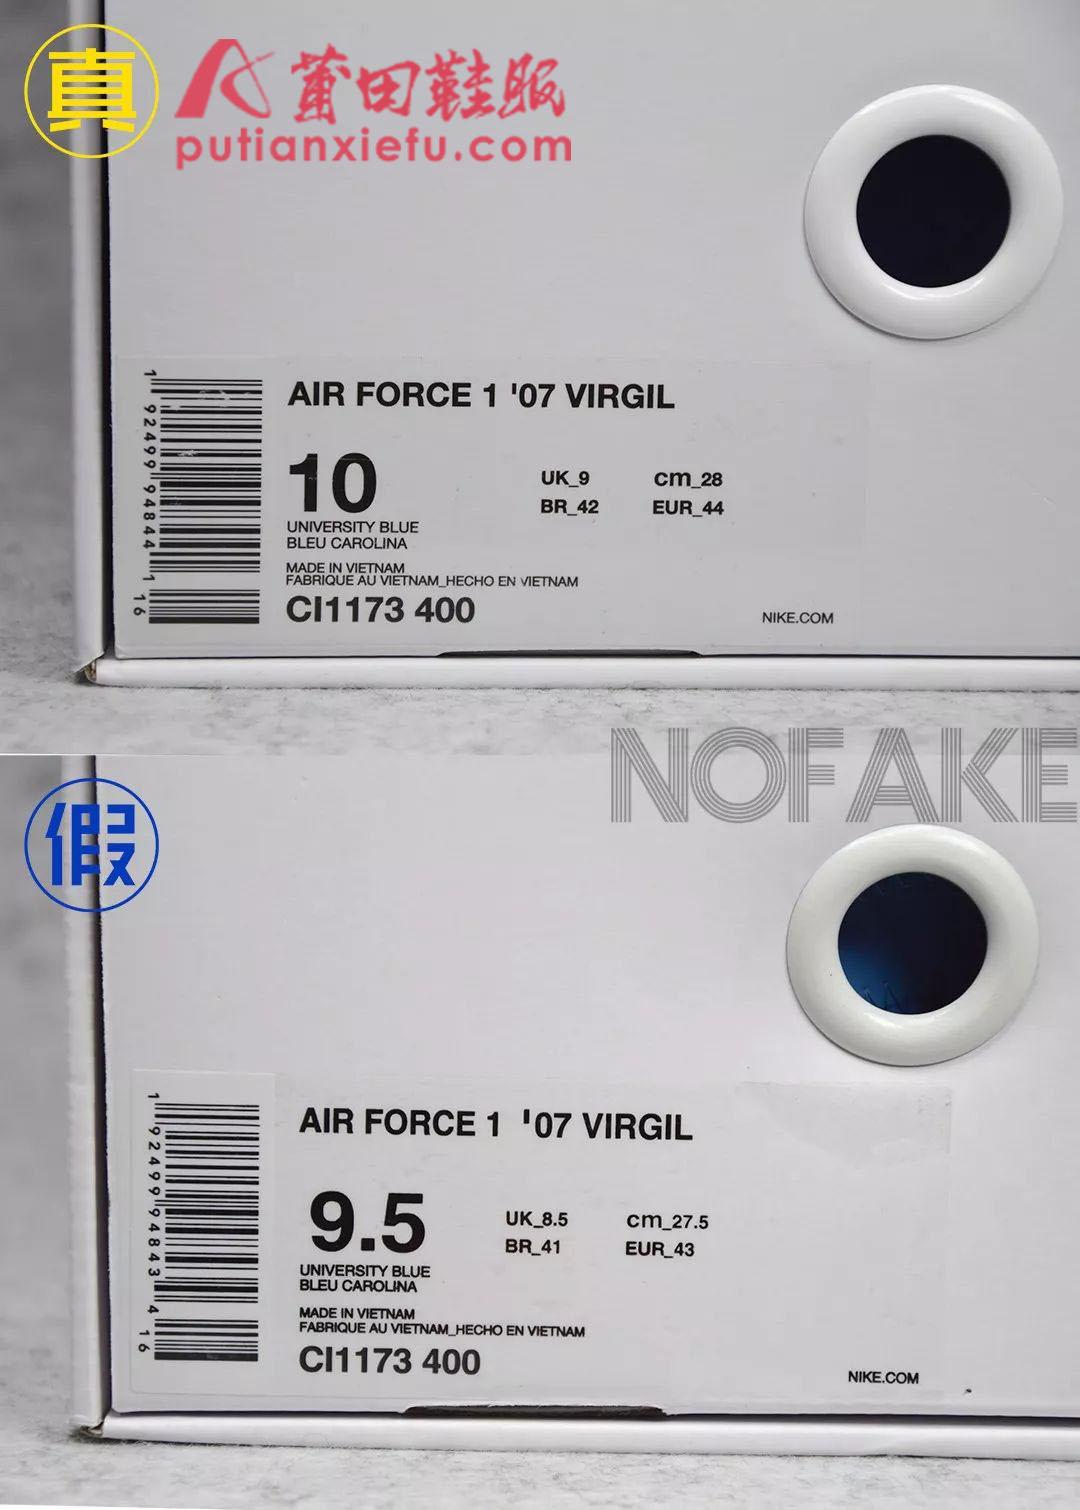 Off-White x Air Force 1 蓝色艺术馆 真假对比